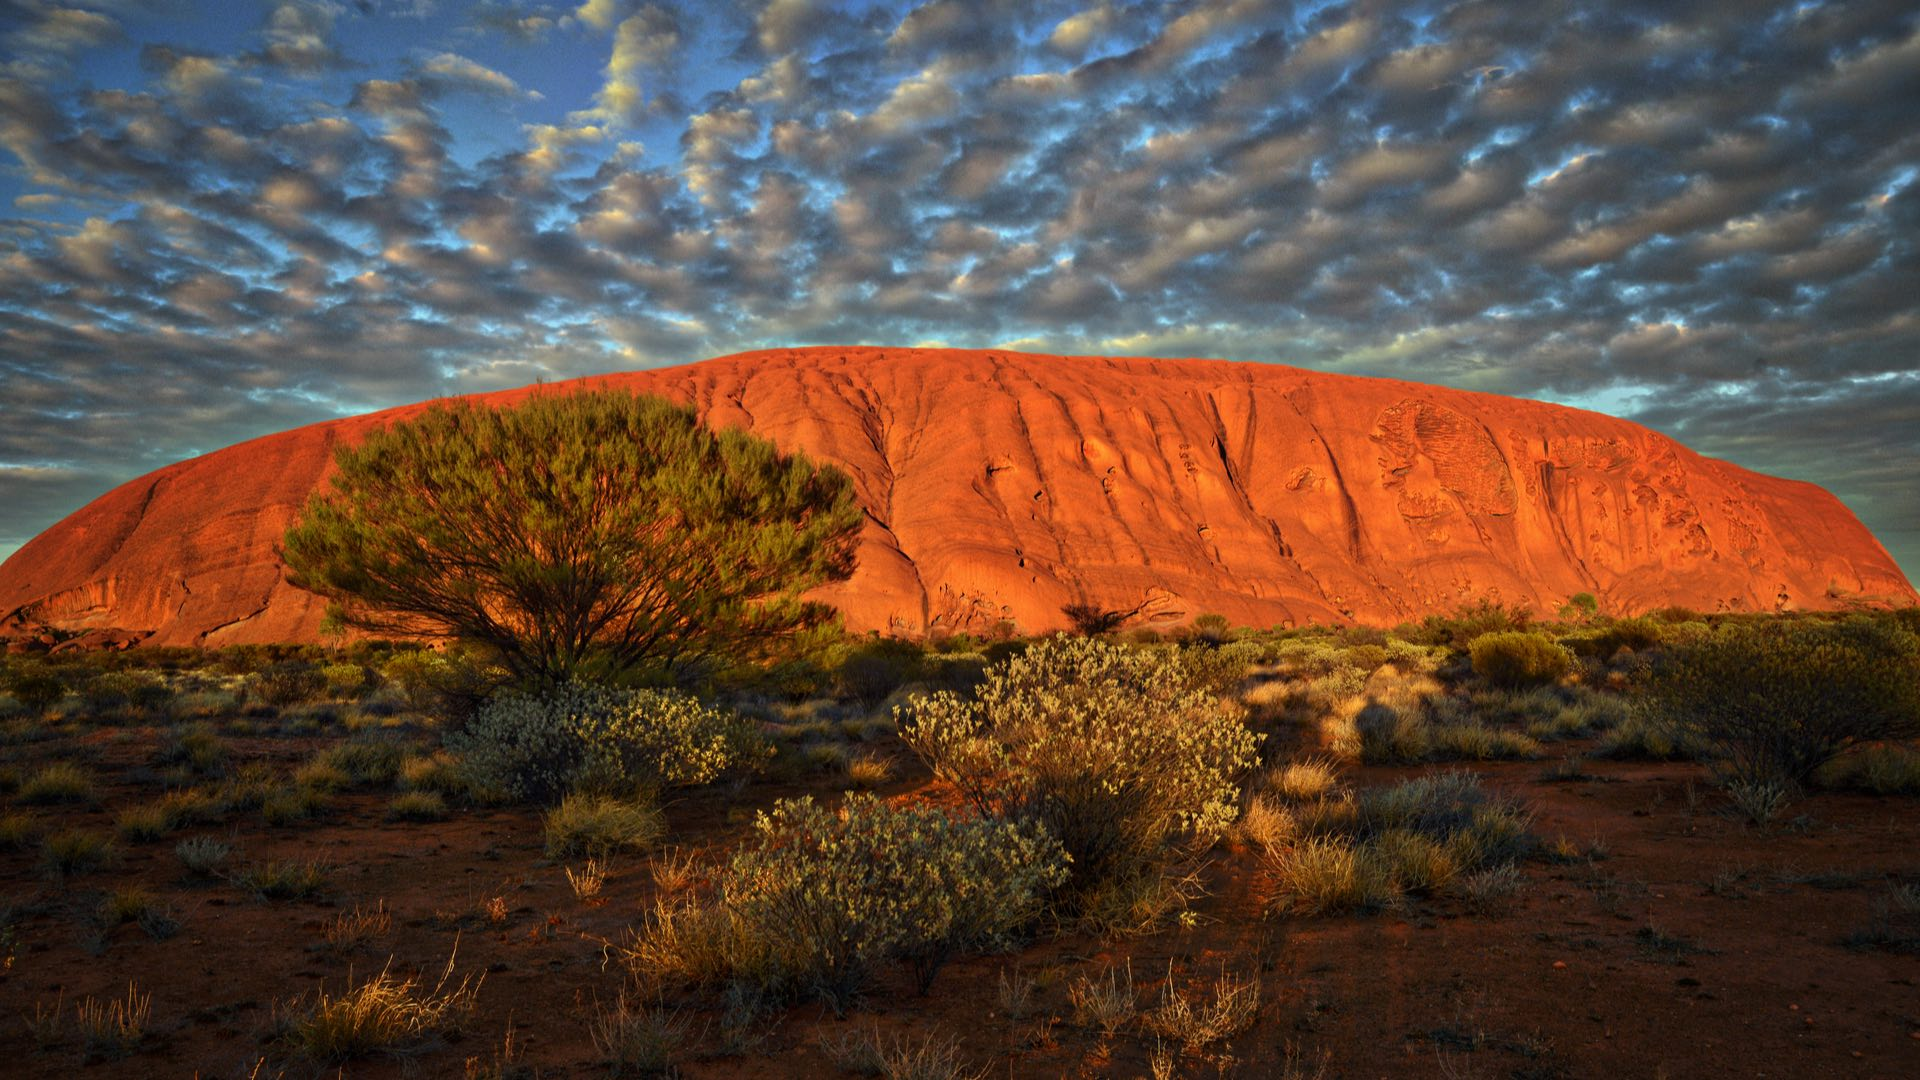 Australien | Uluru | ©Rajeev Rajagopalan/shutterstock.com